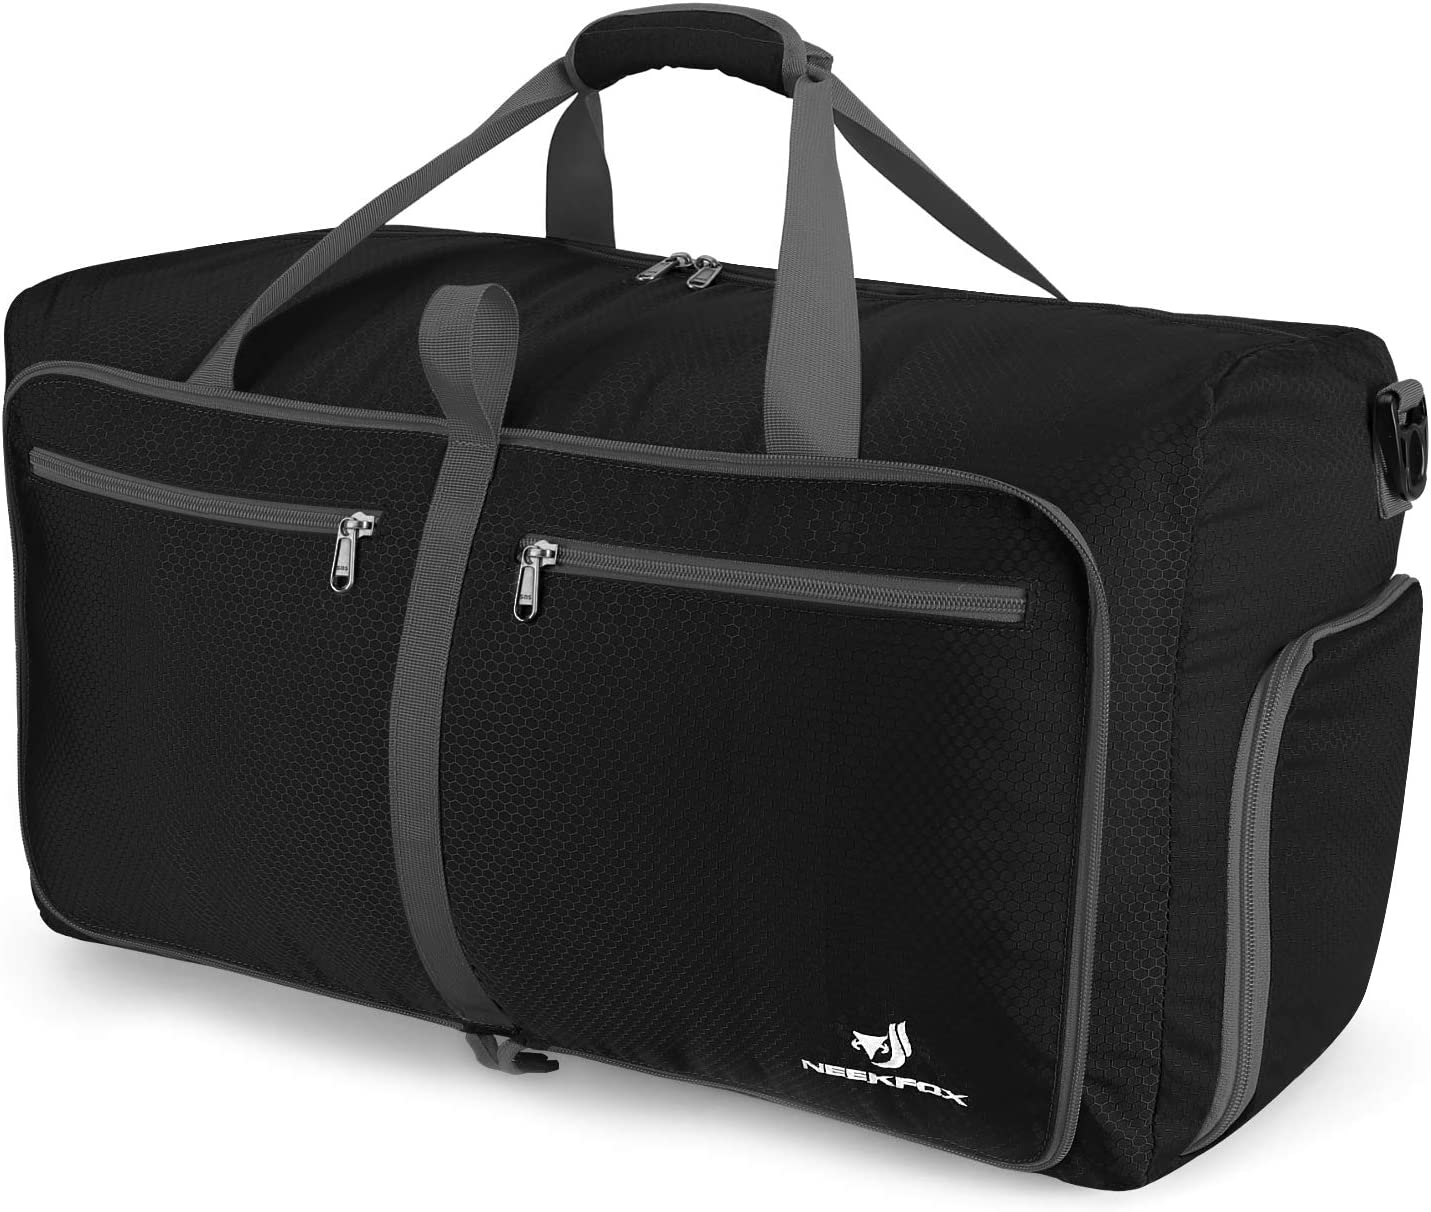 NEEKFOX Foldable Travel Duffel Bag Large Sports Duffle Gym Bag Packable Lightweight Travel Luggage Bag for Men Women 60L